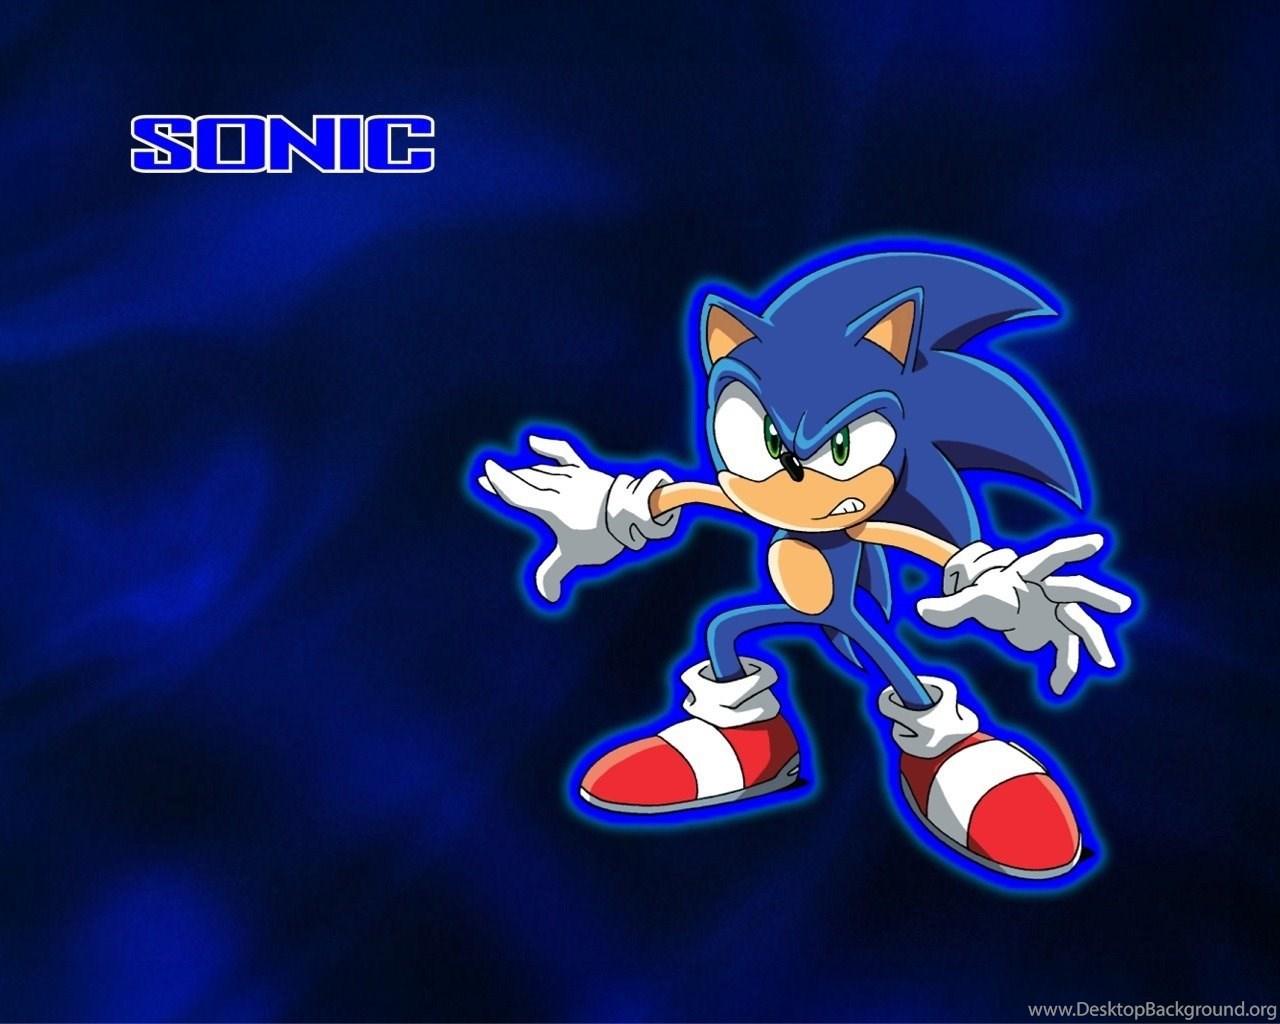 Sonic The Hedgehog Wallpapers Hd Backgrounds Wallpapers Desktop Background